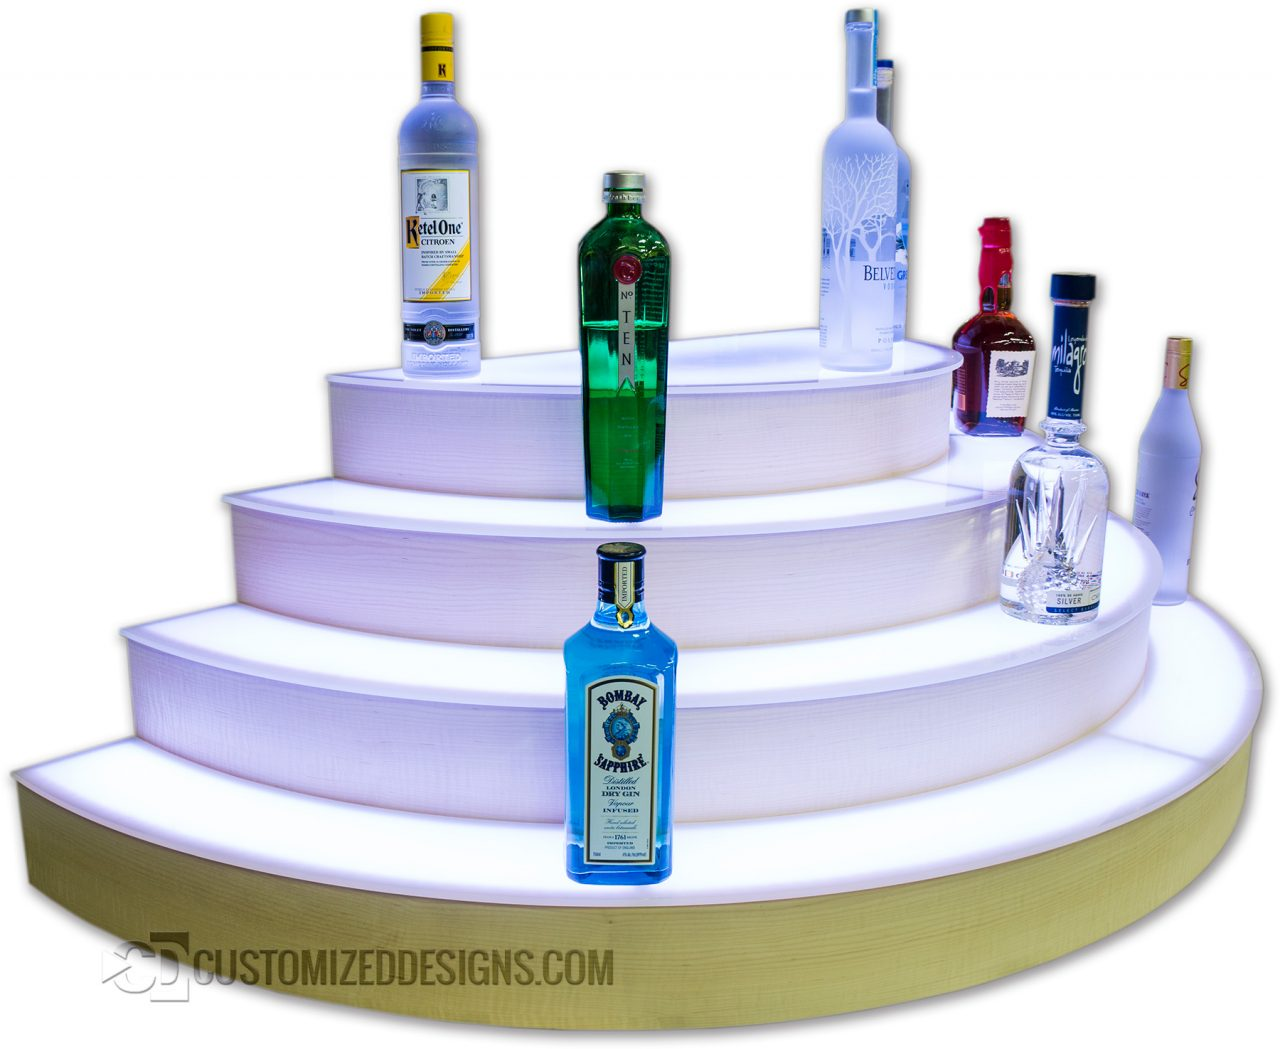 Custom Half Moon Circular Liquor Bottle Shelves - 4 Tier